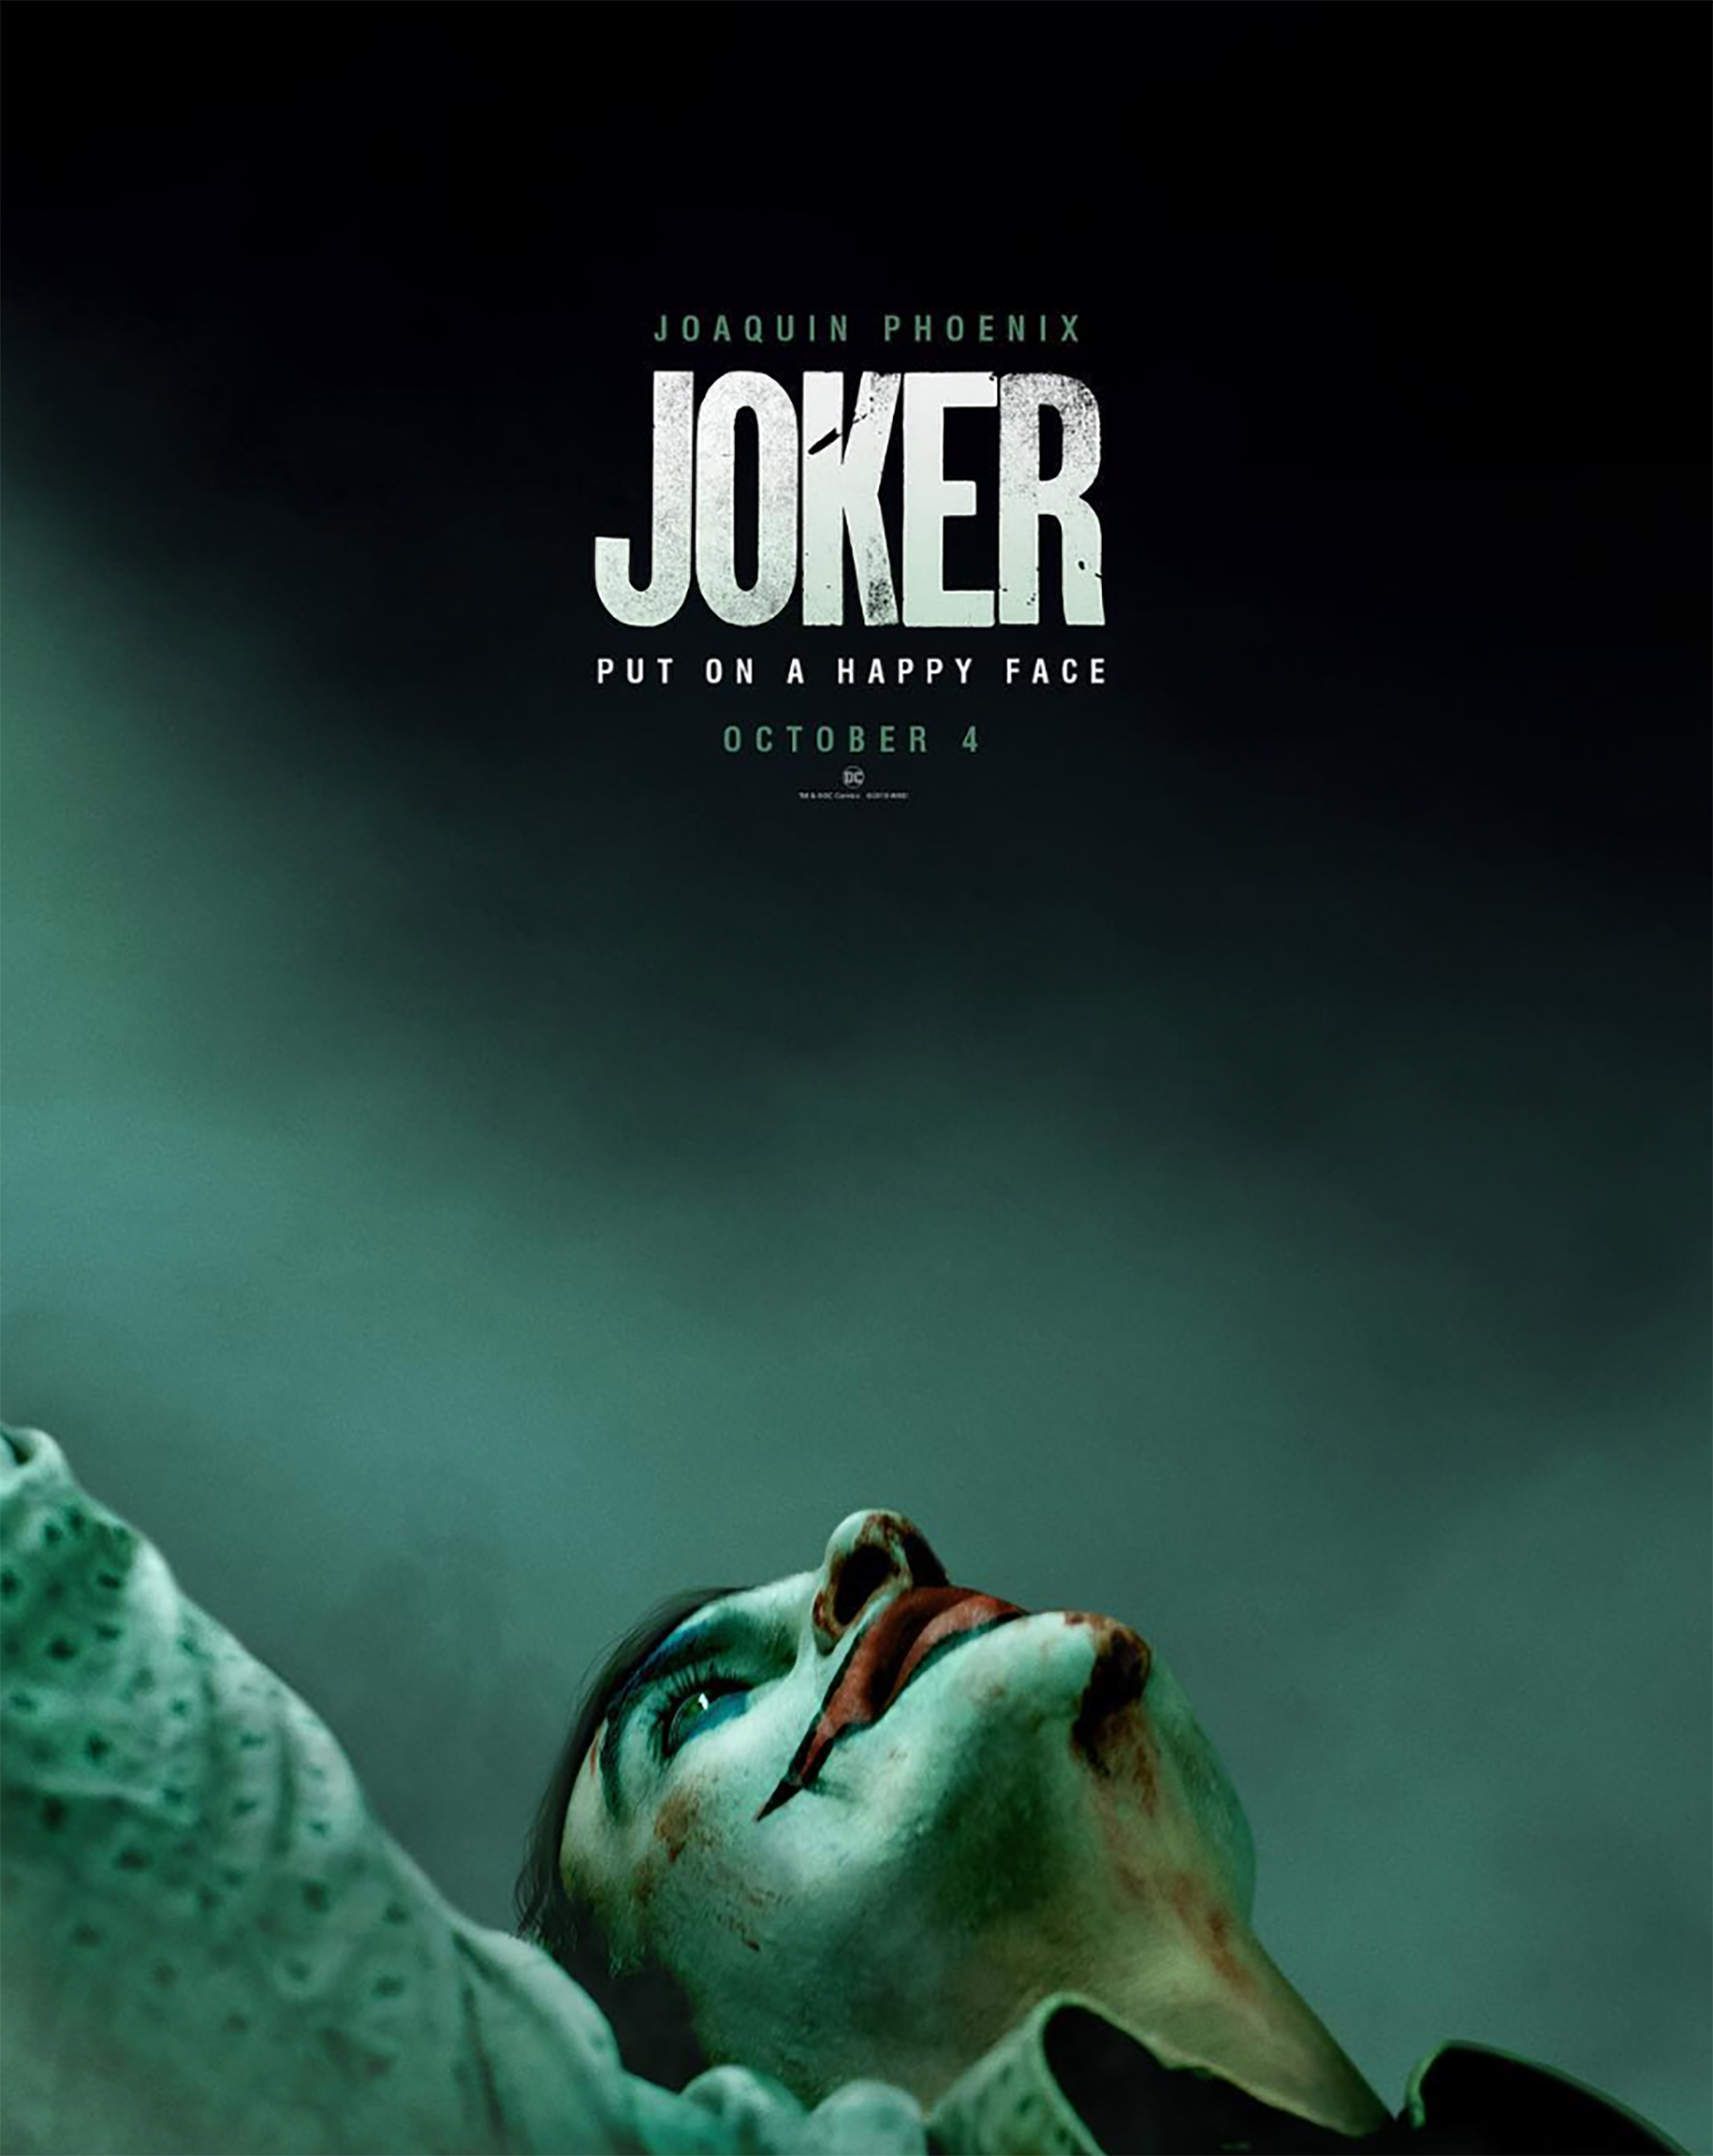 Joker film starring Joaquin Phoenix